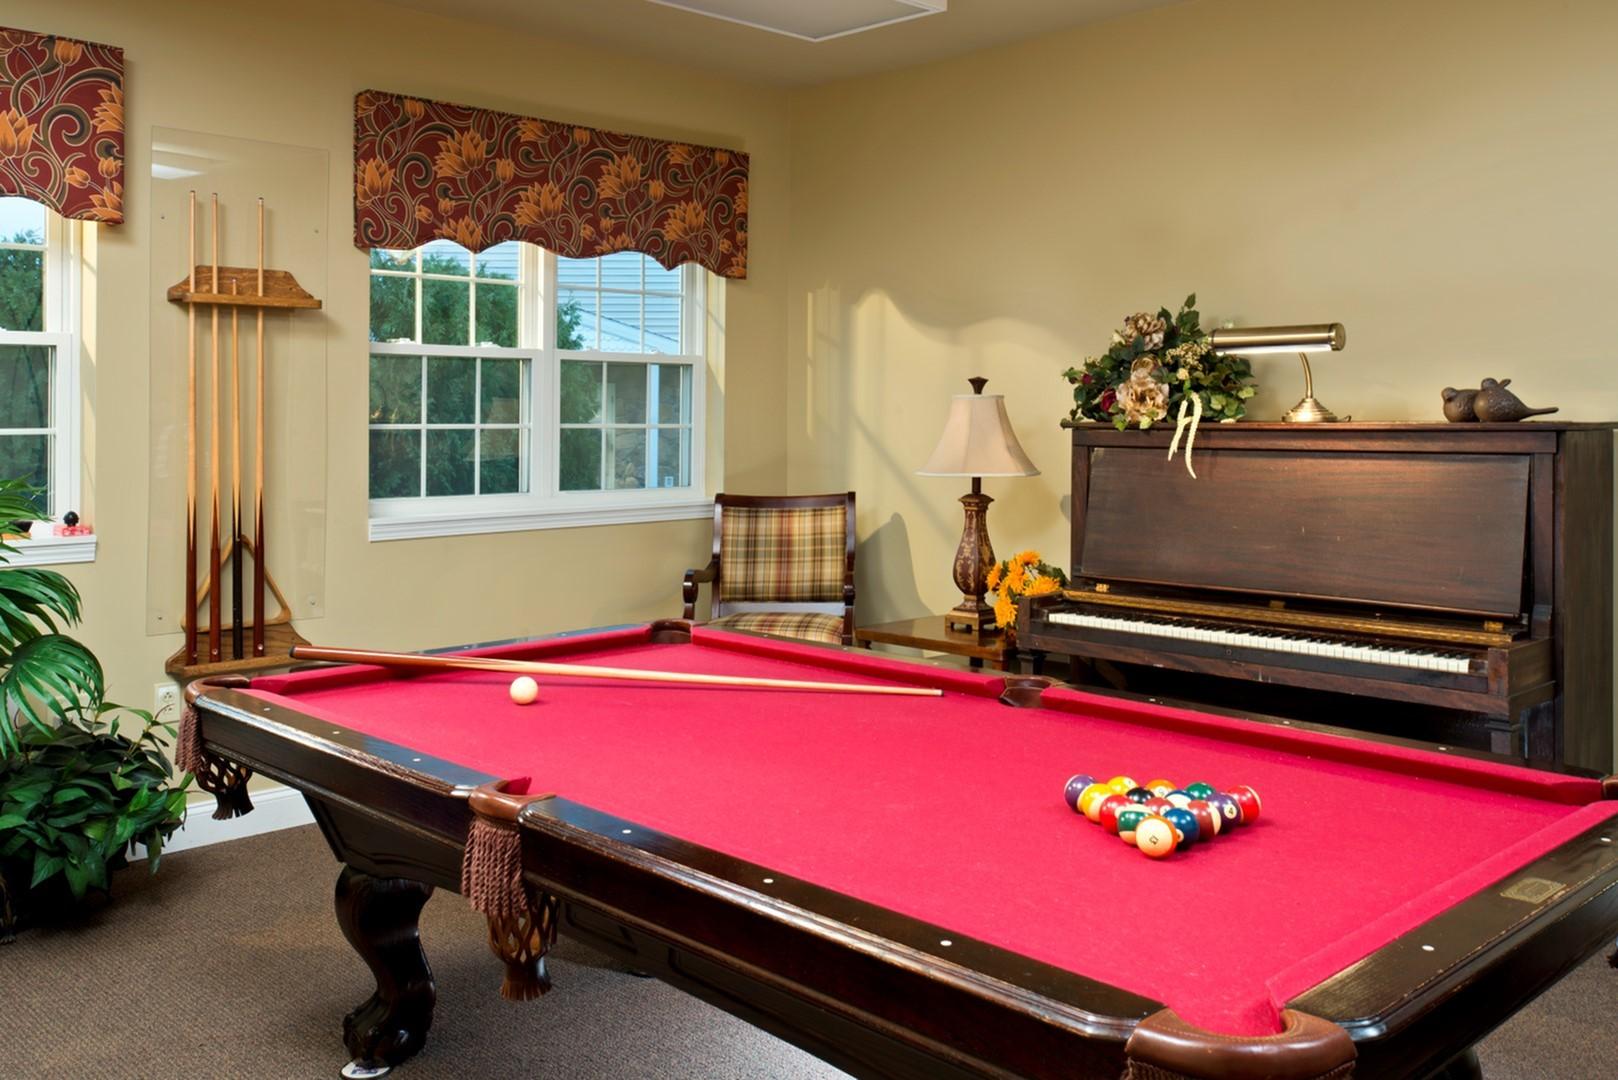 Hearthstone Village billiard room